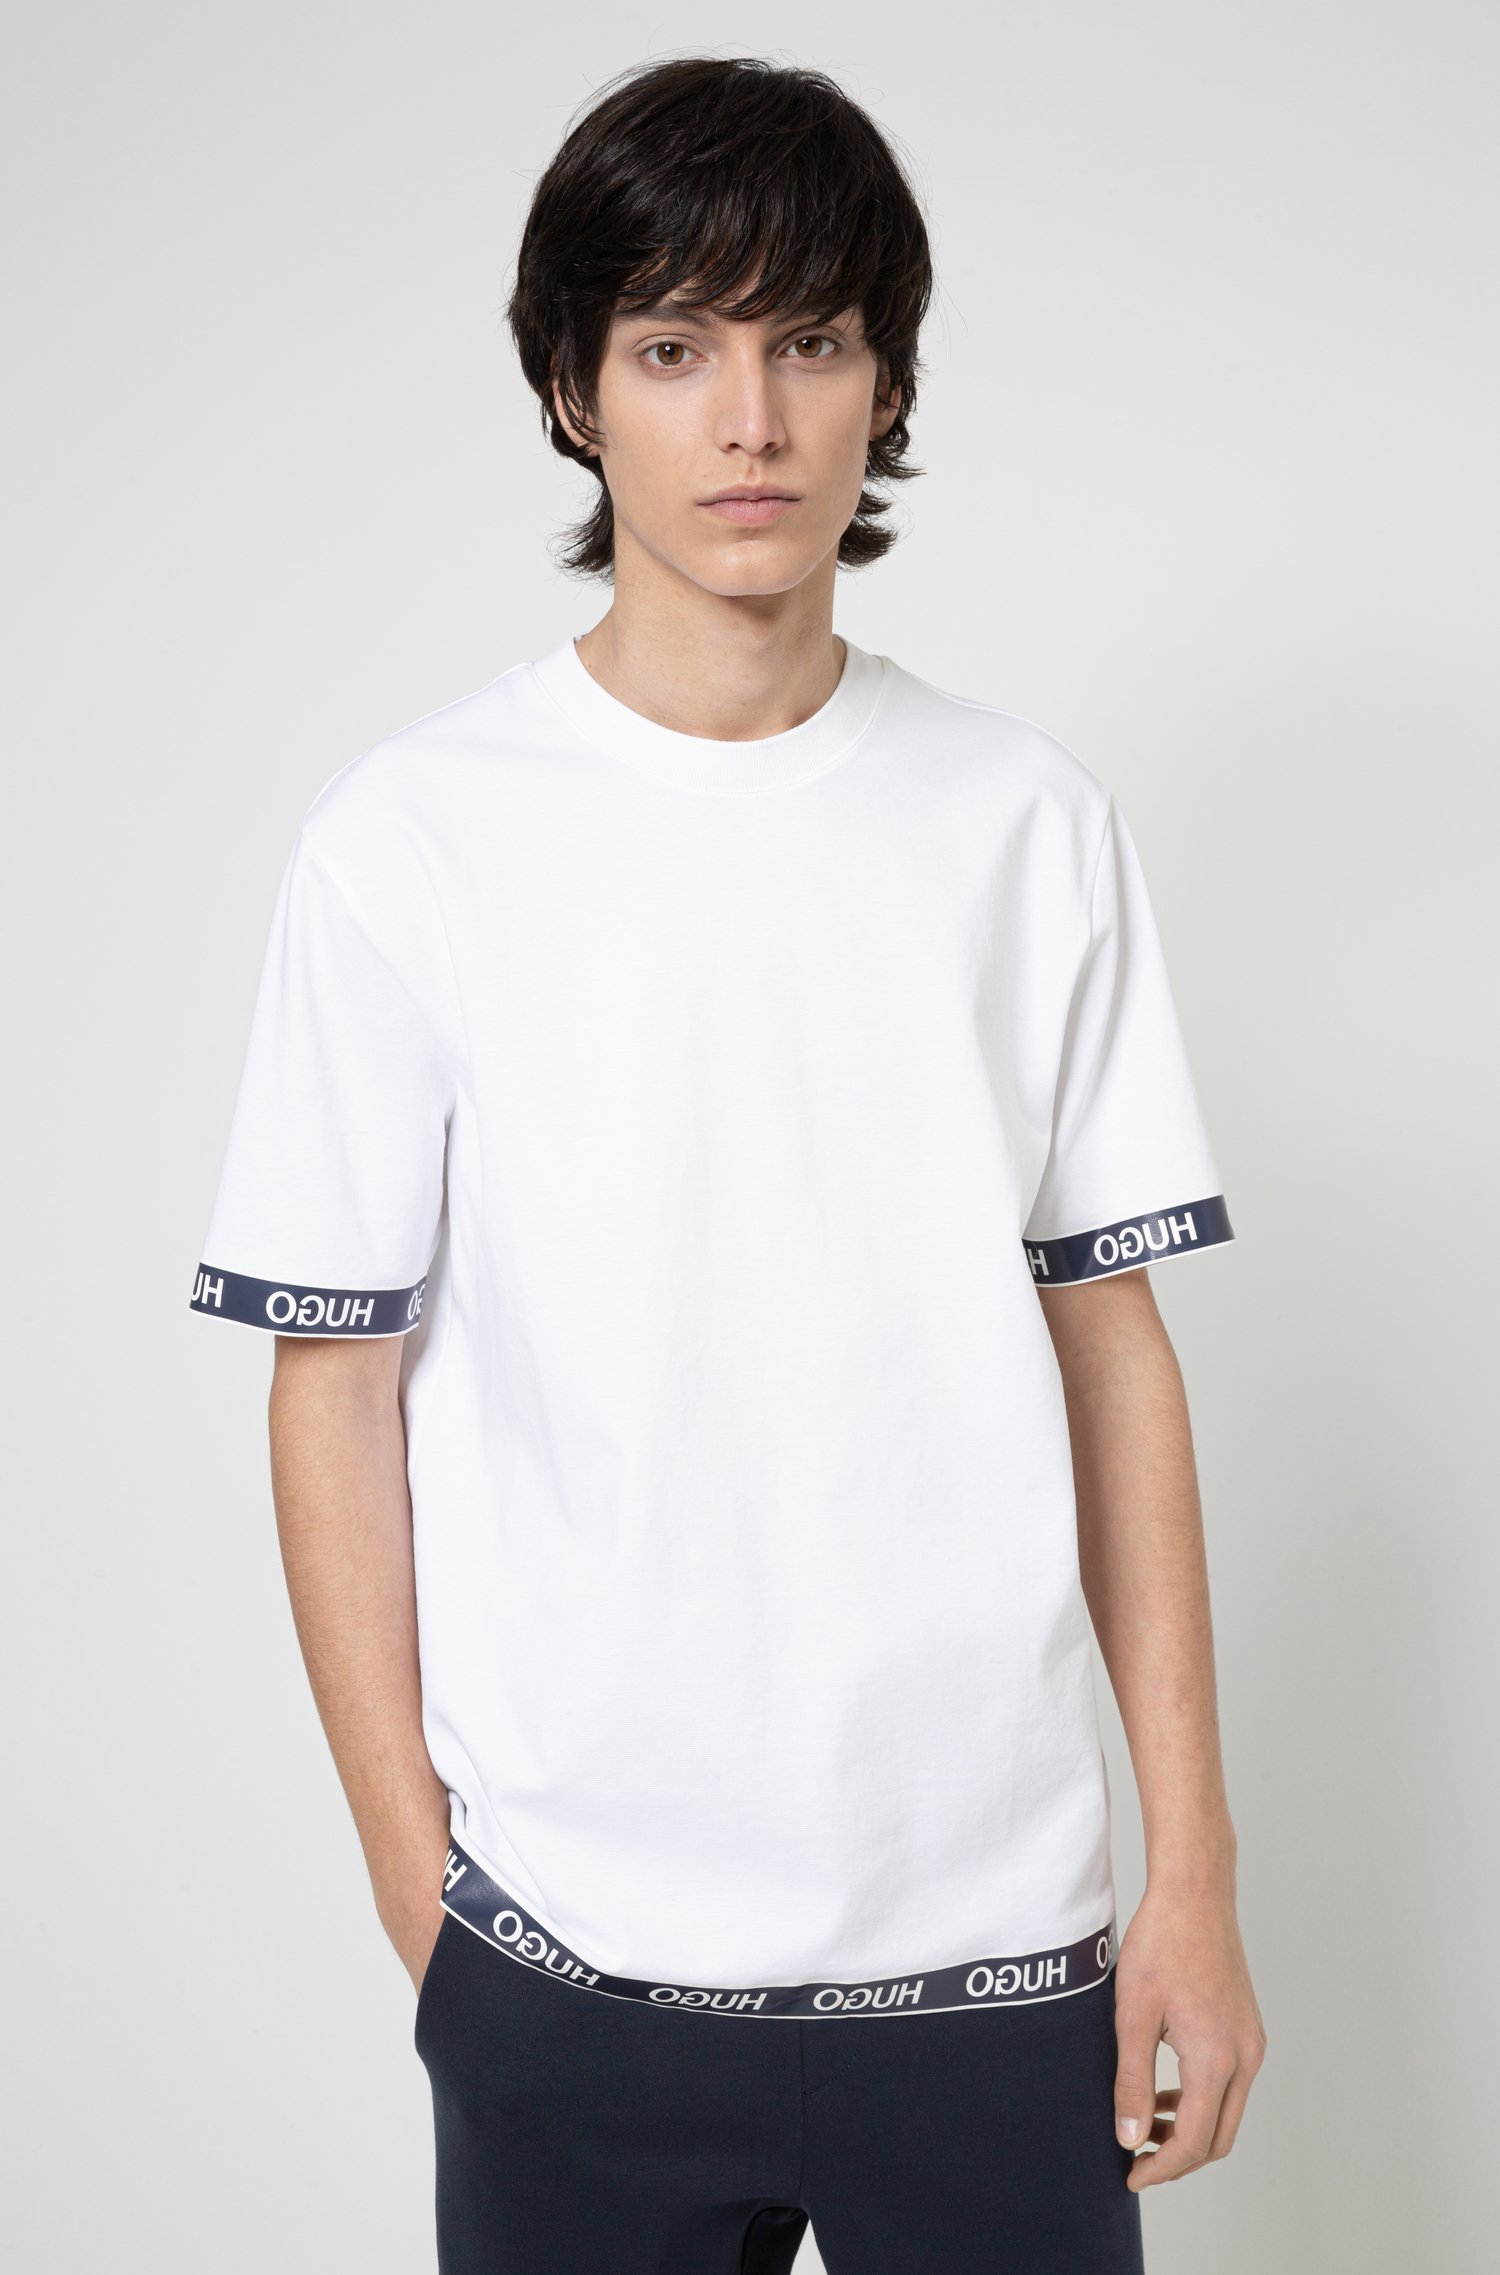 T-Shirt aus Baumwoll-Mix mit Logos an Ärmelbündchen und Saum, Weiß